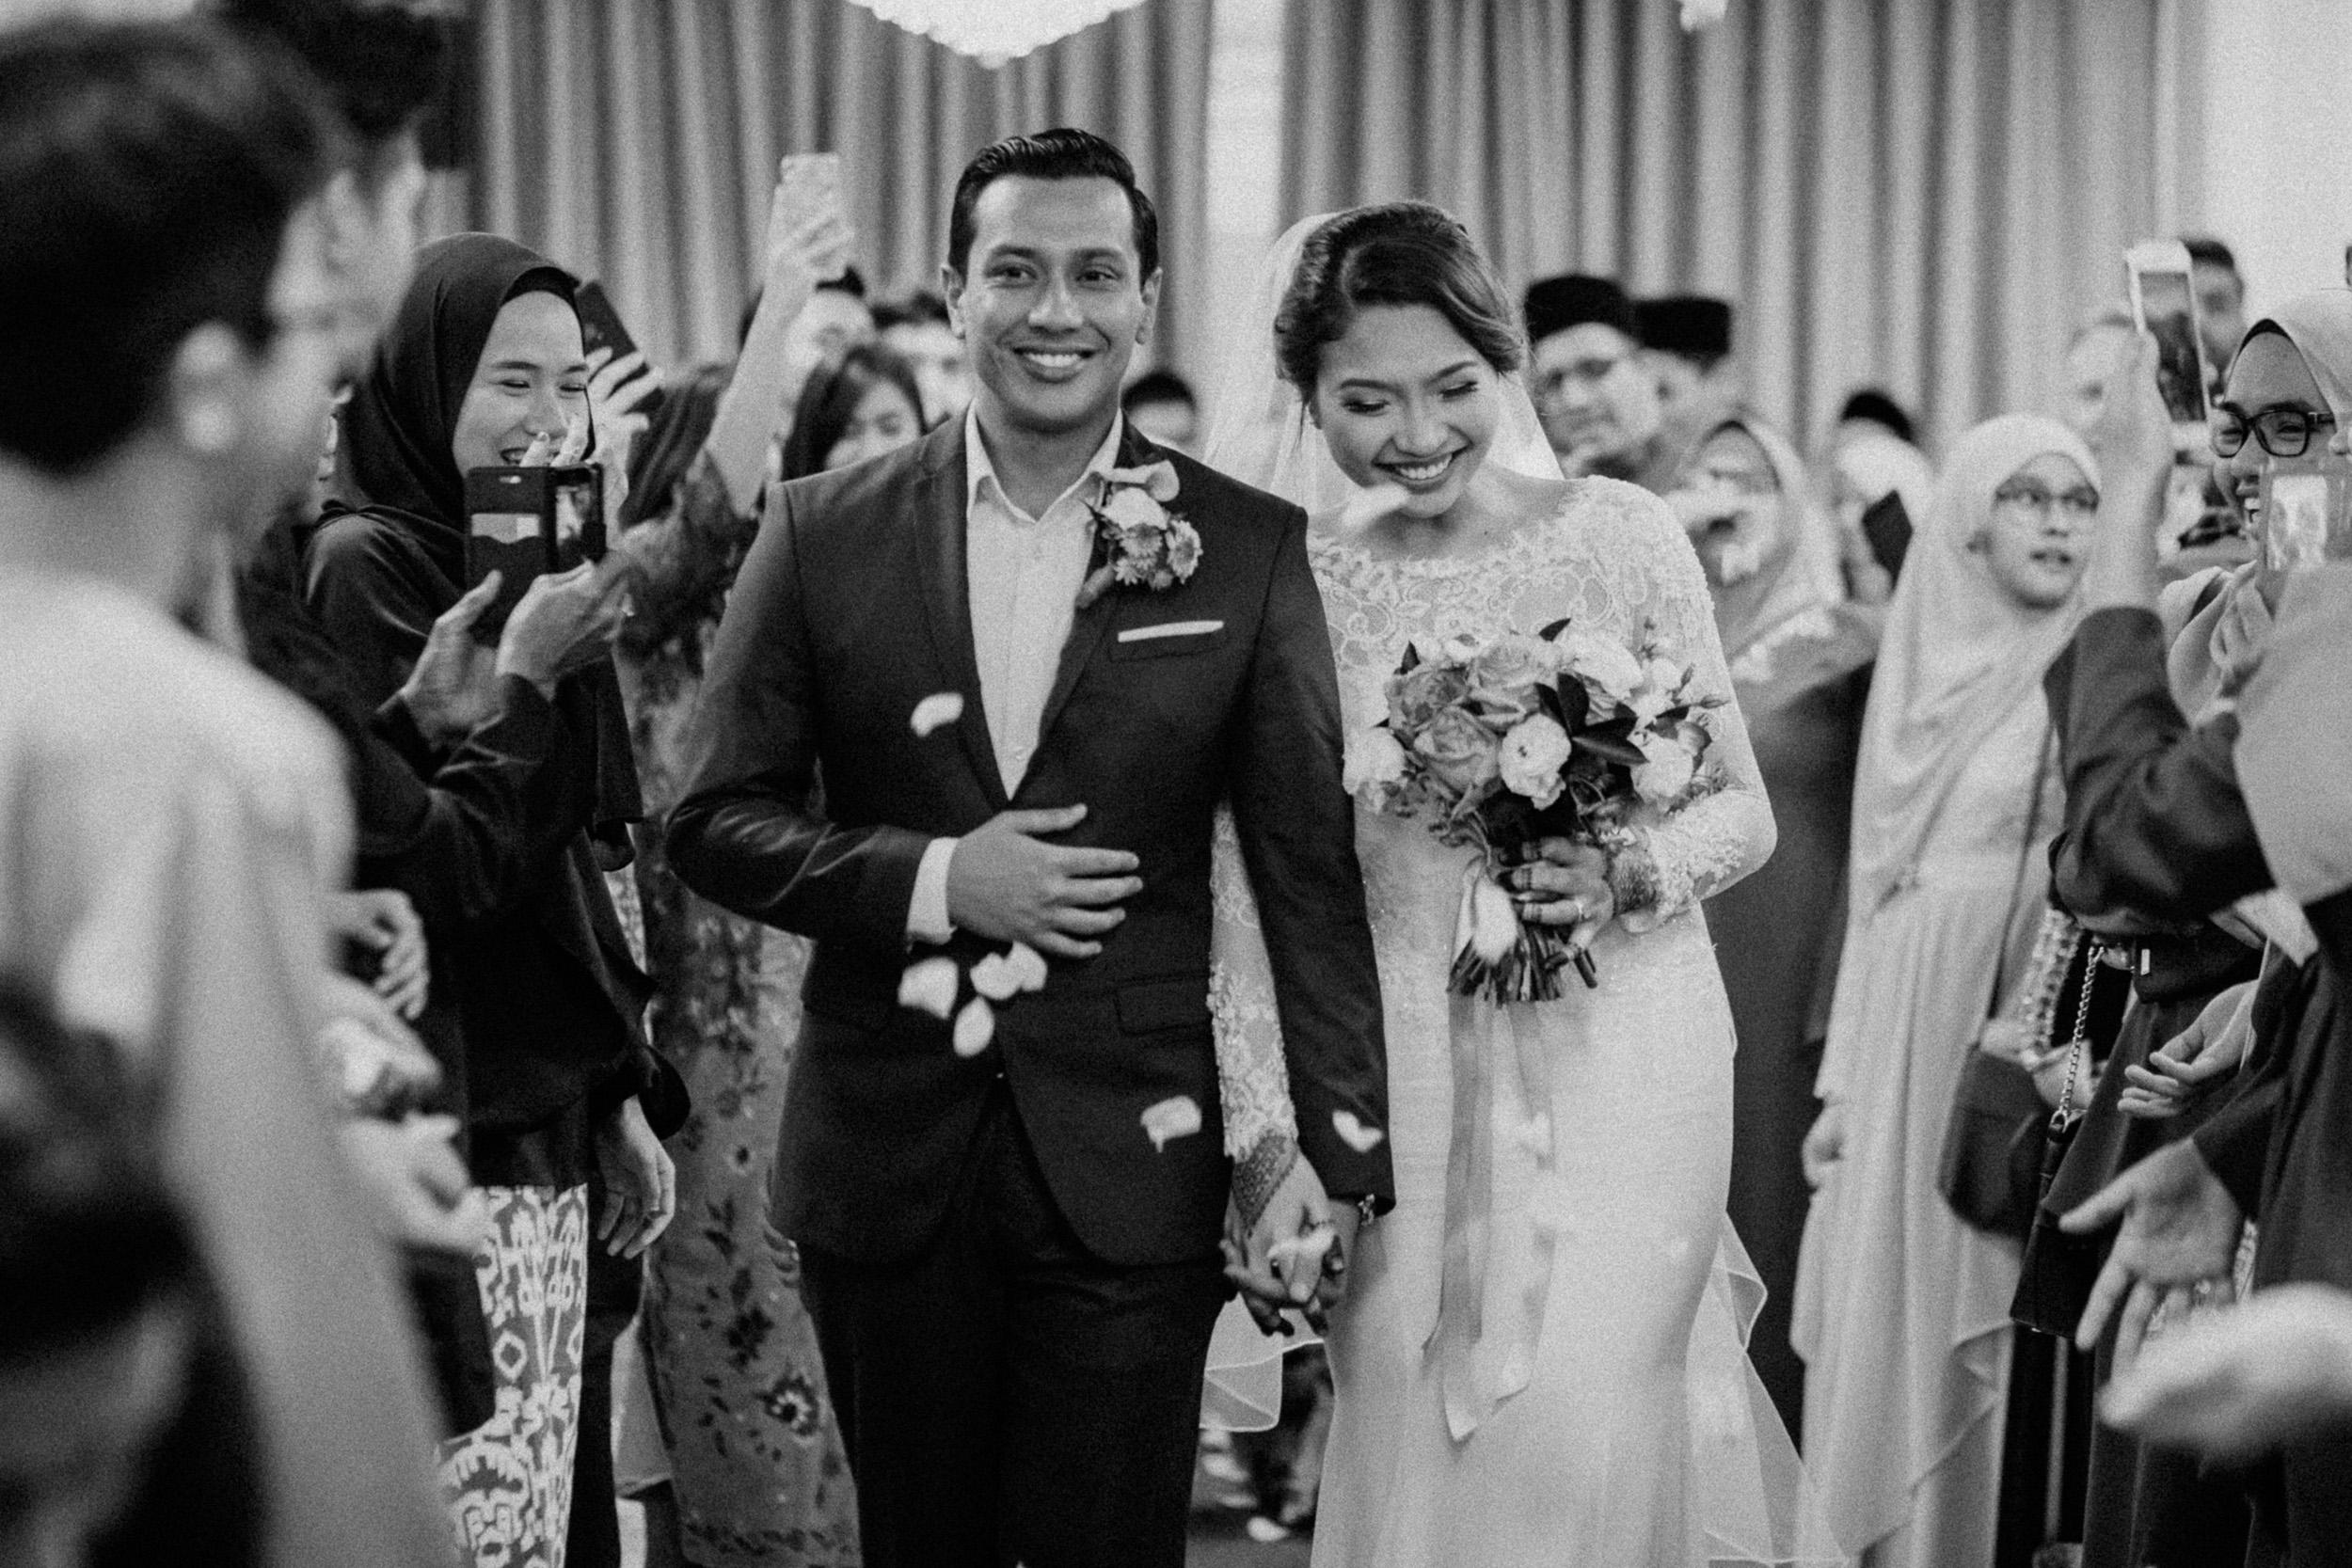 singapore-wedding-photographer-photography-wmt2017-141.jpg